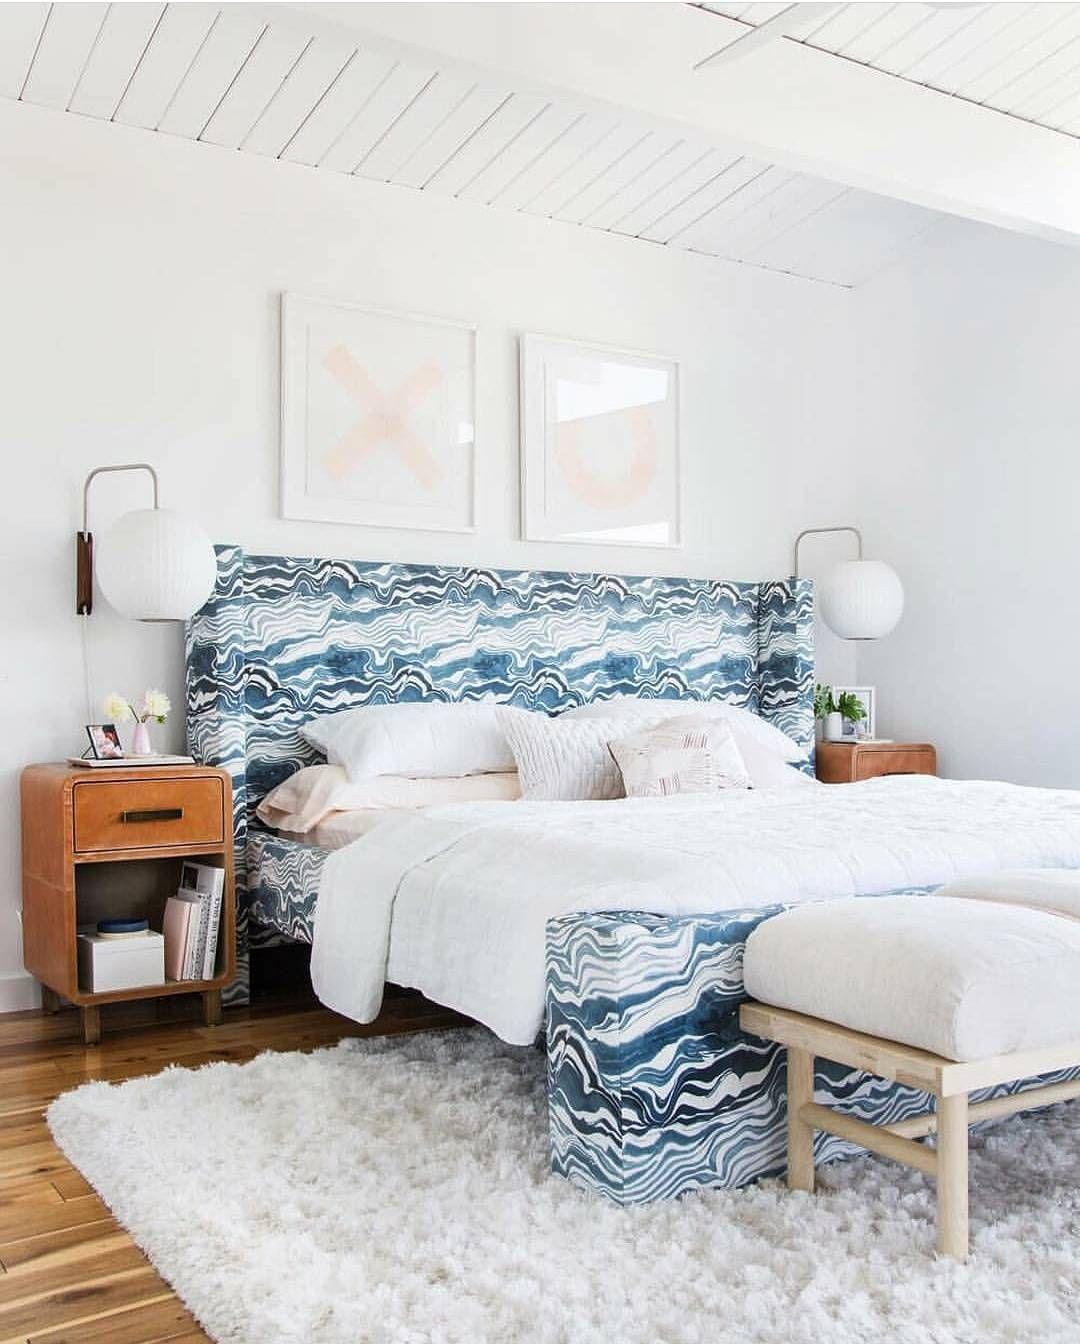 Master bedroom art above bed  Night stands bench carpet light and art inspiration  Interior